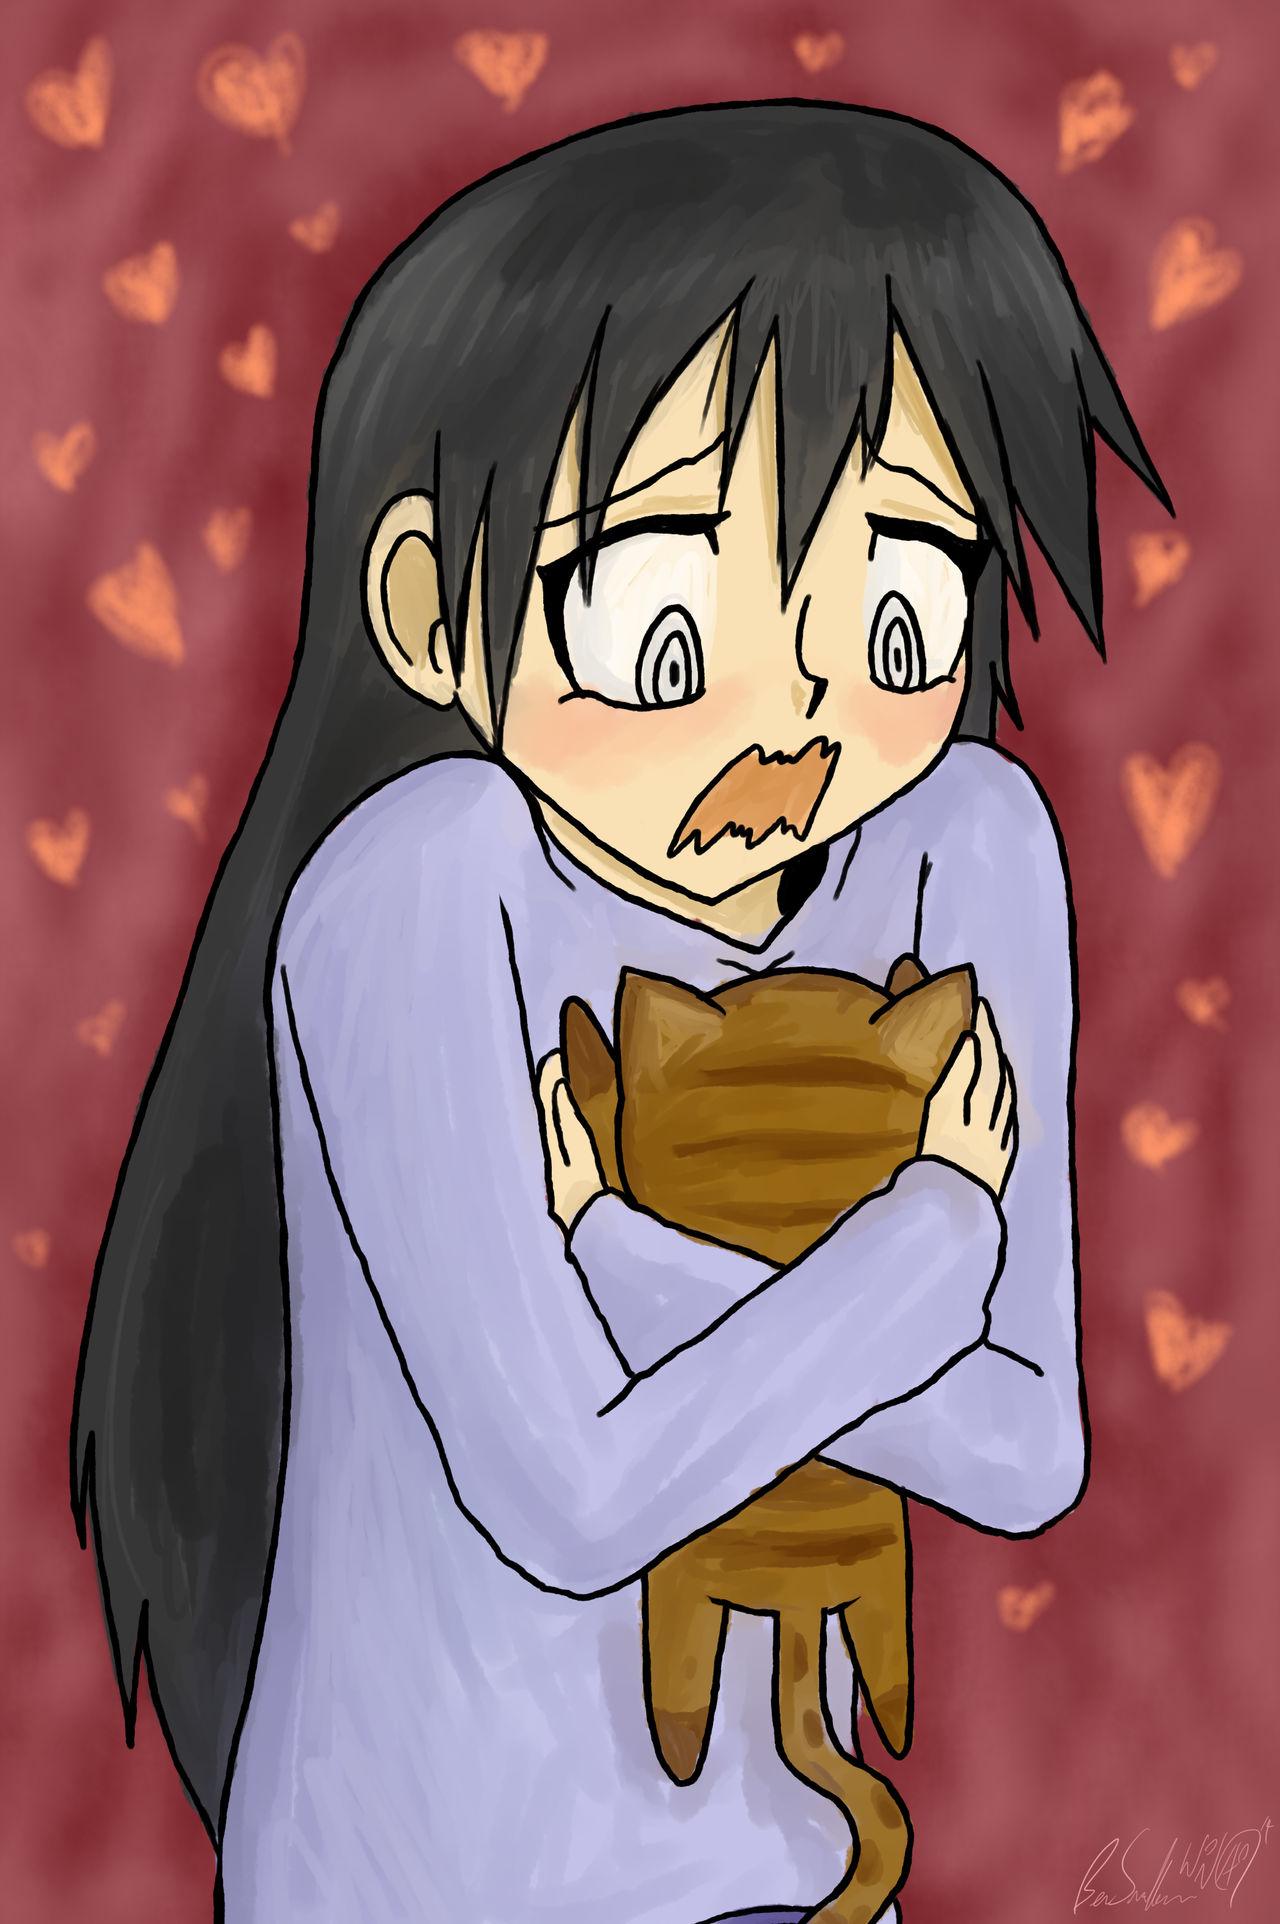 Sakaki-san is too darn cute by Wonchop